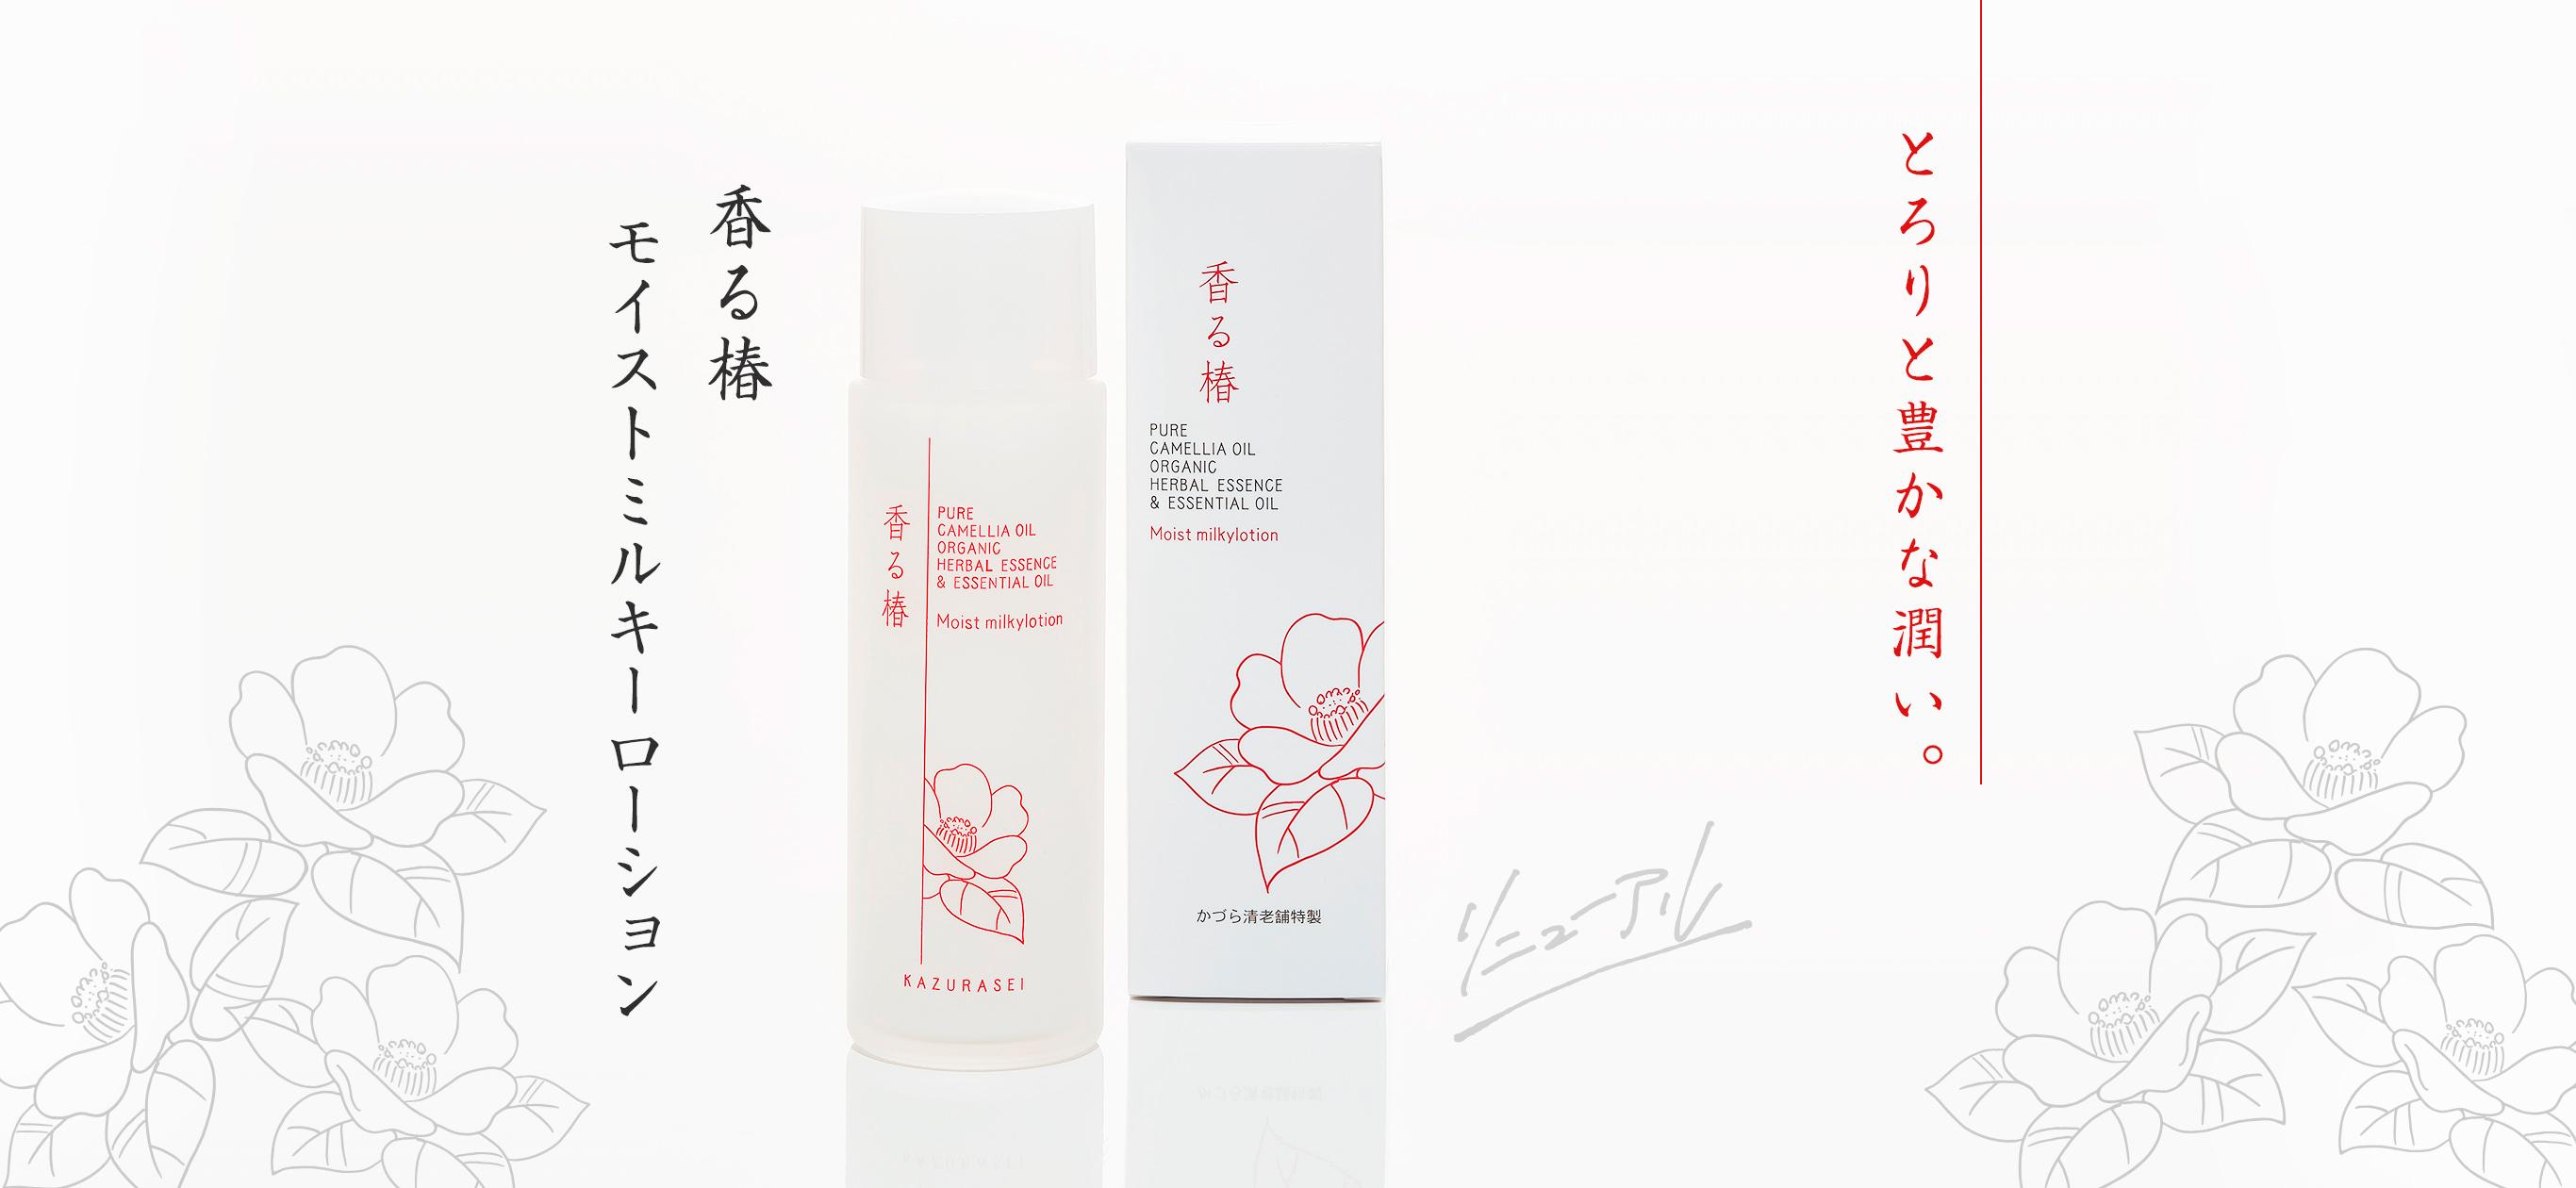 New 香る椿 モイストミルキーローション